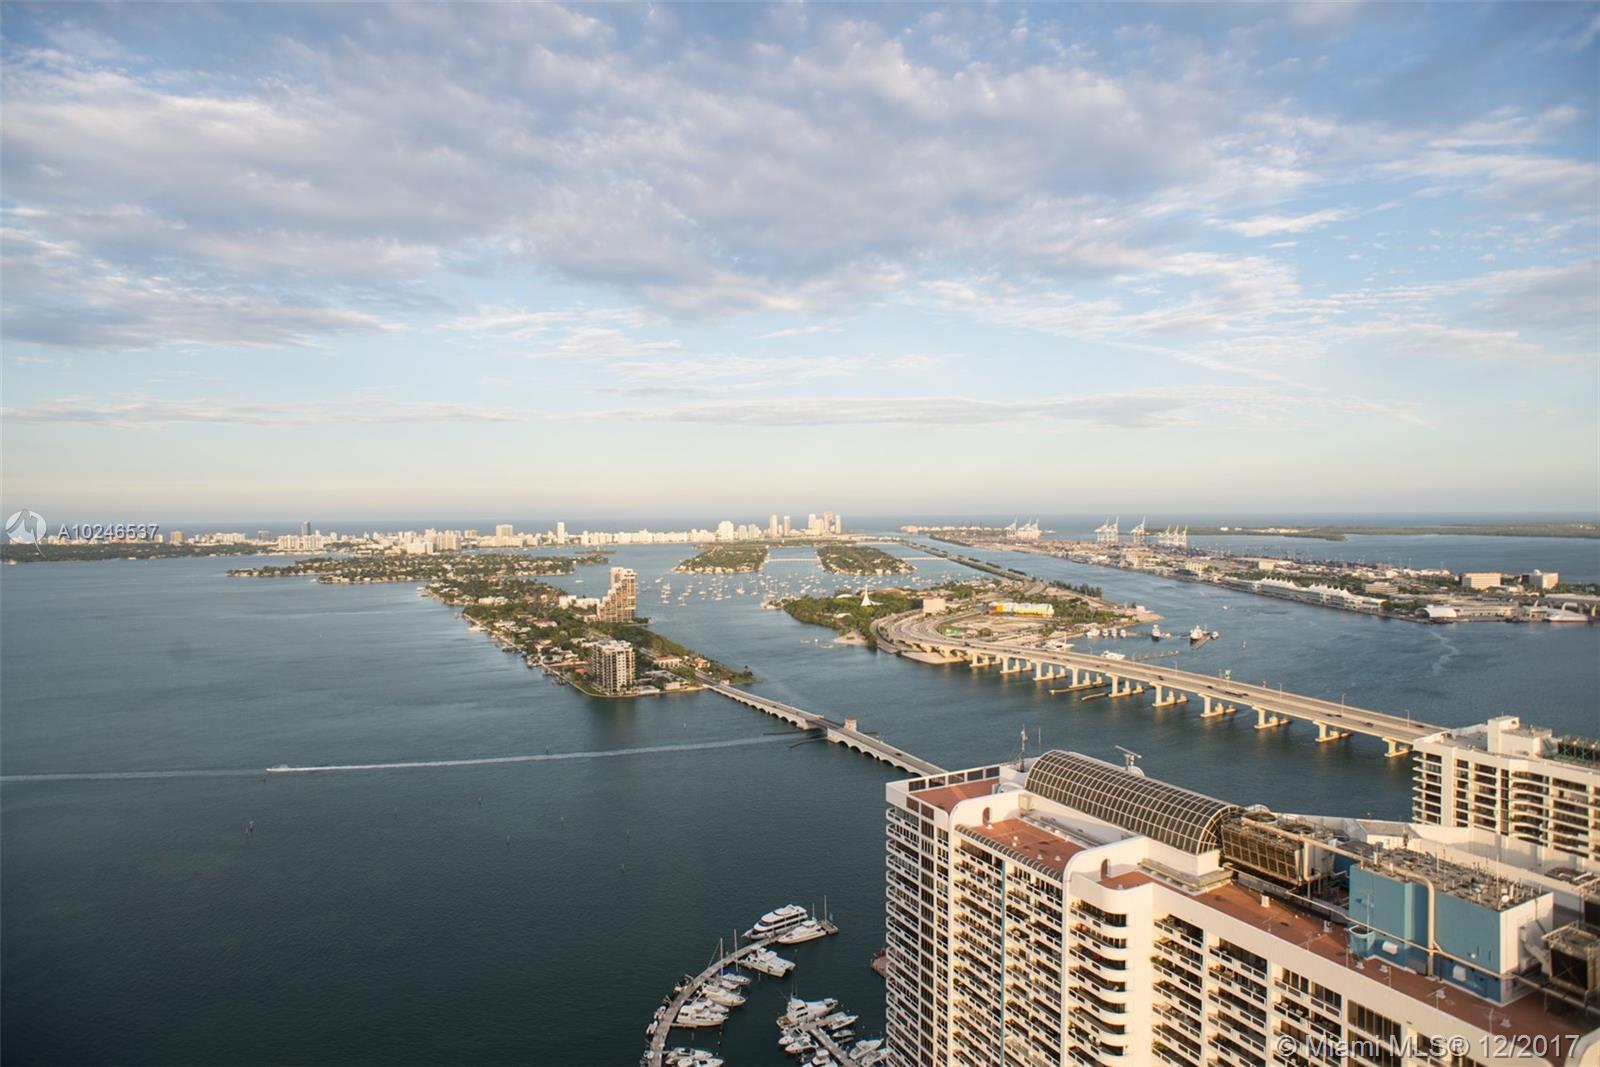 1750 N Bayshore Dr #5601, Miami FL, 33132